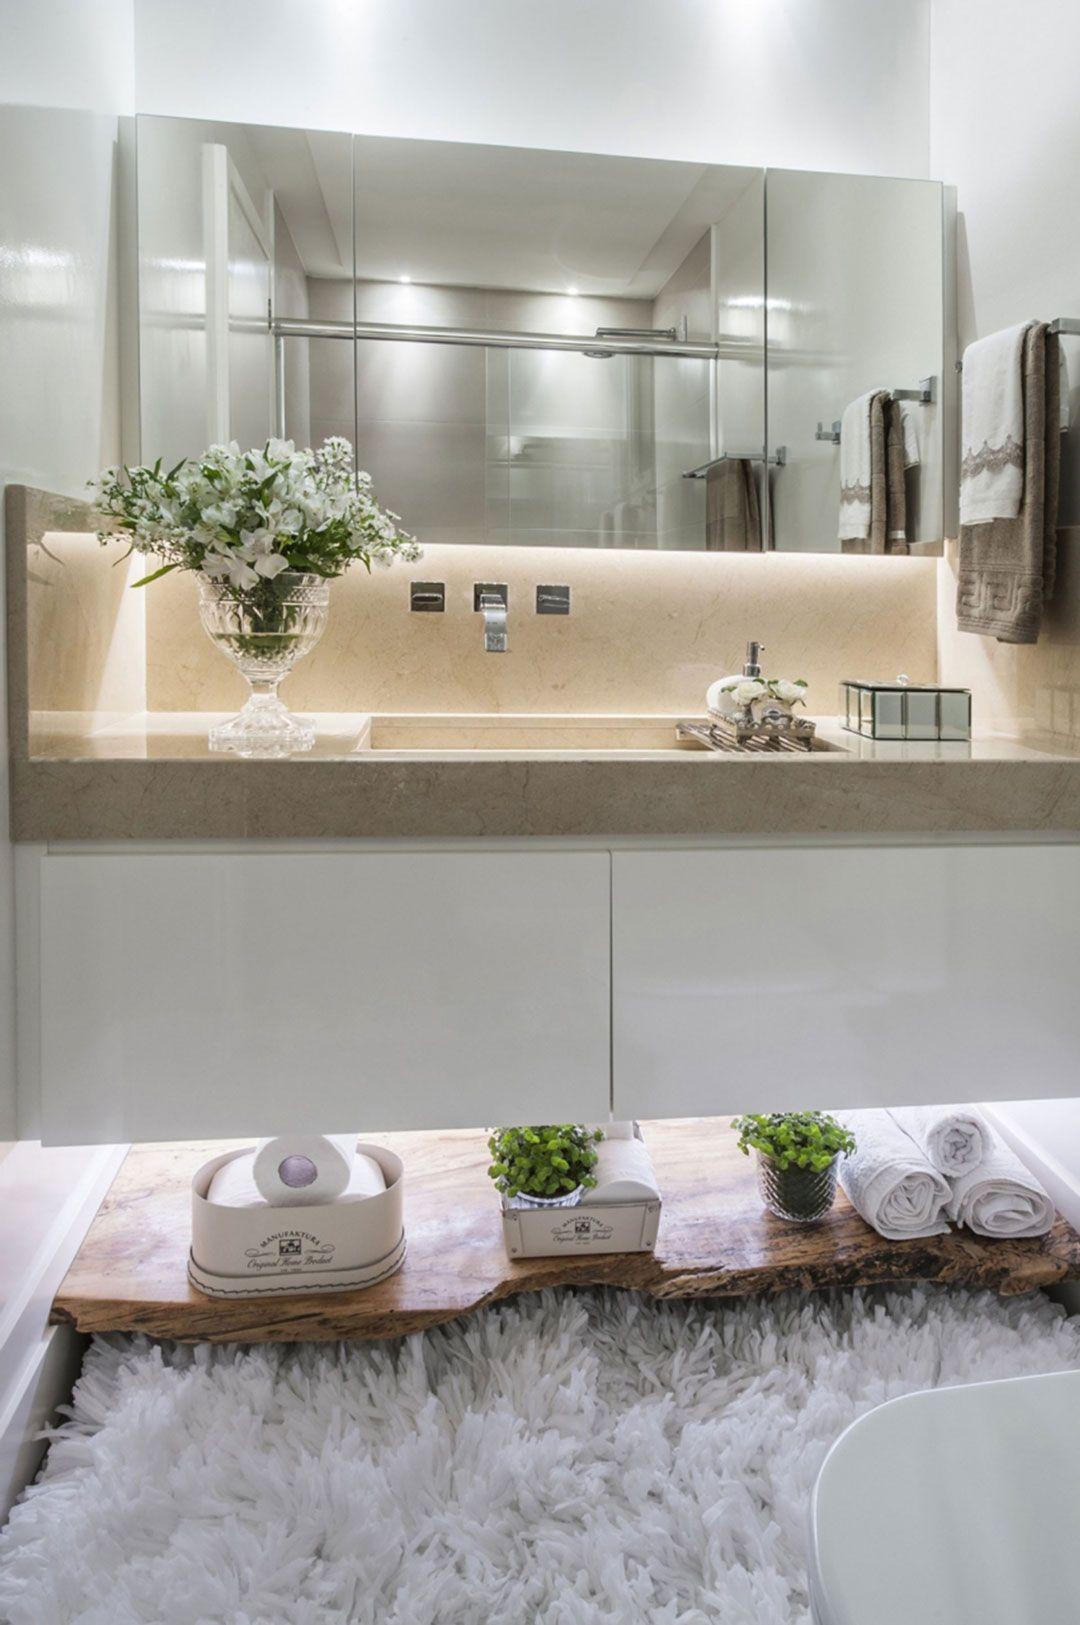 creative rubbed auckland gallery liberty bathroomware vanity nz in units bathroom appliances fixtures oil bronze decoration